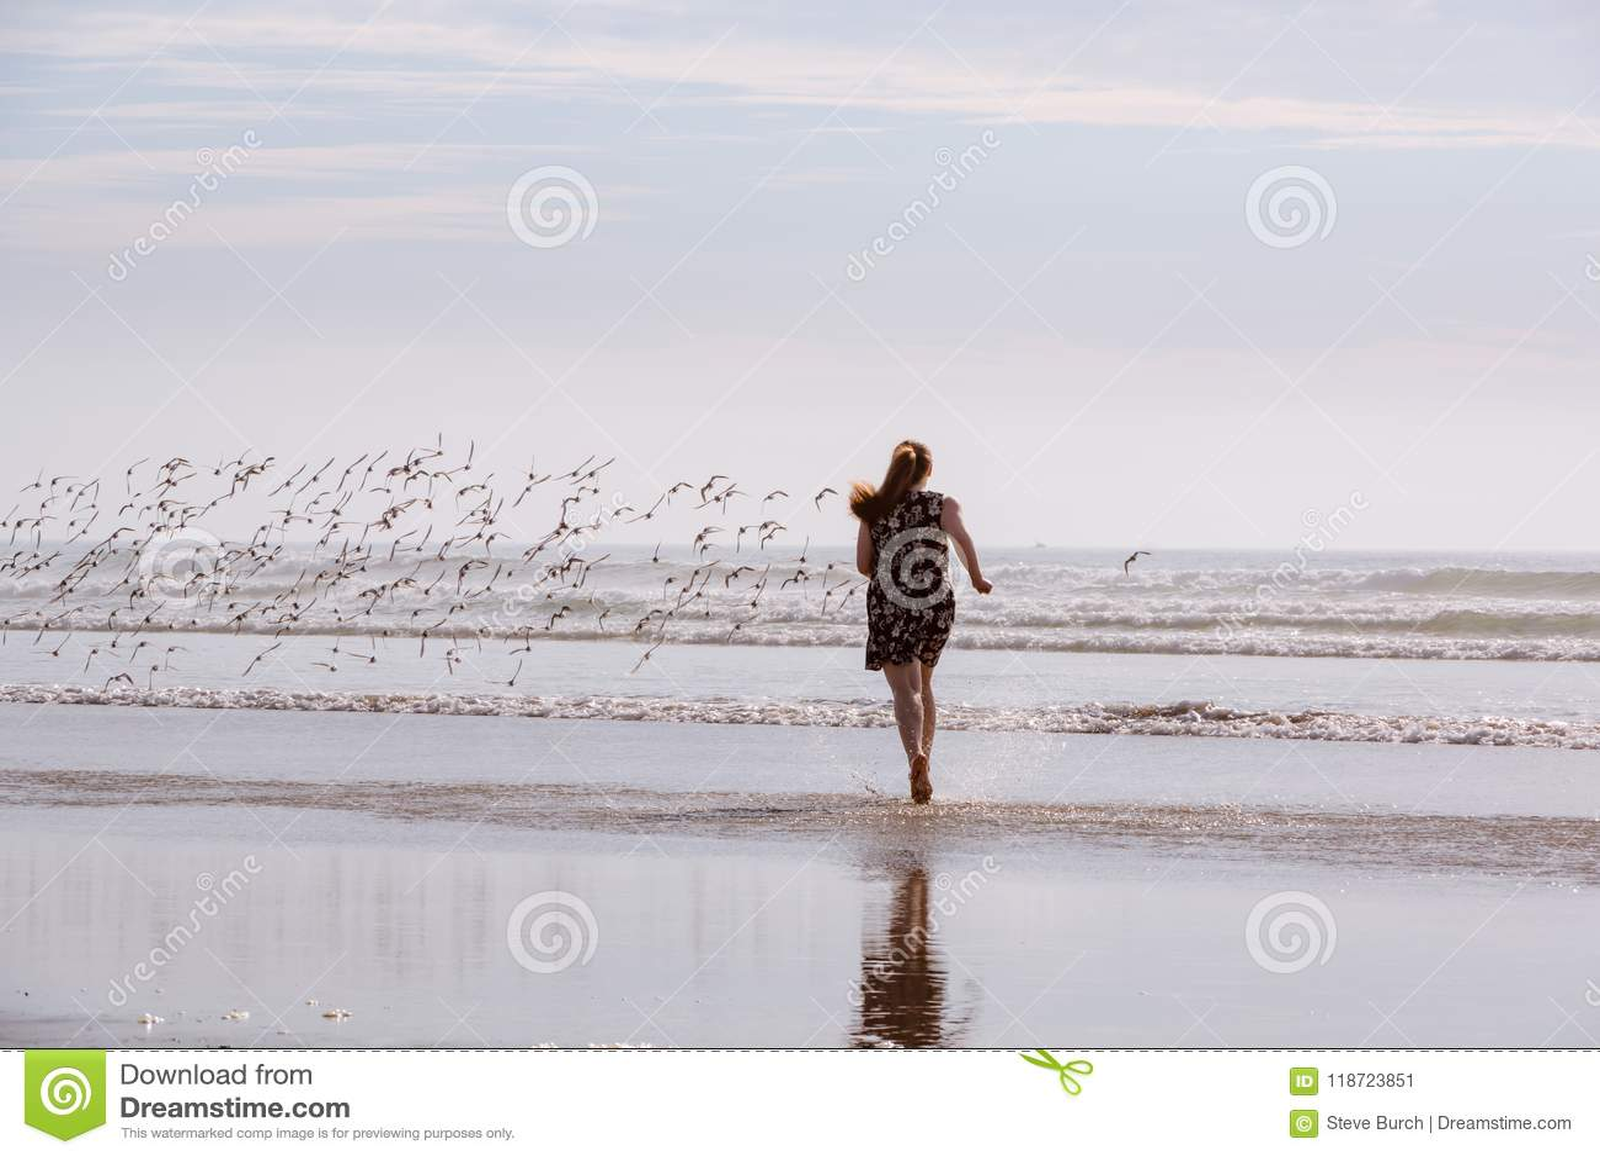 Woman Chasing Birds On Beach